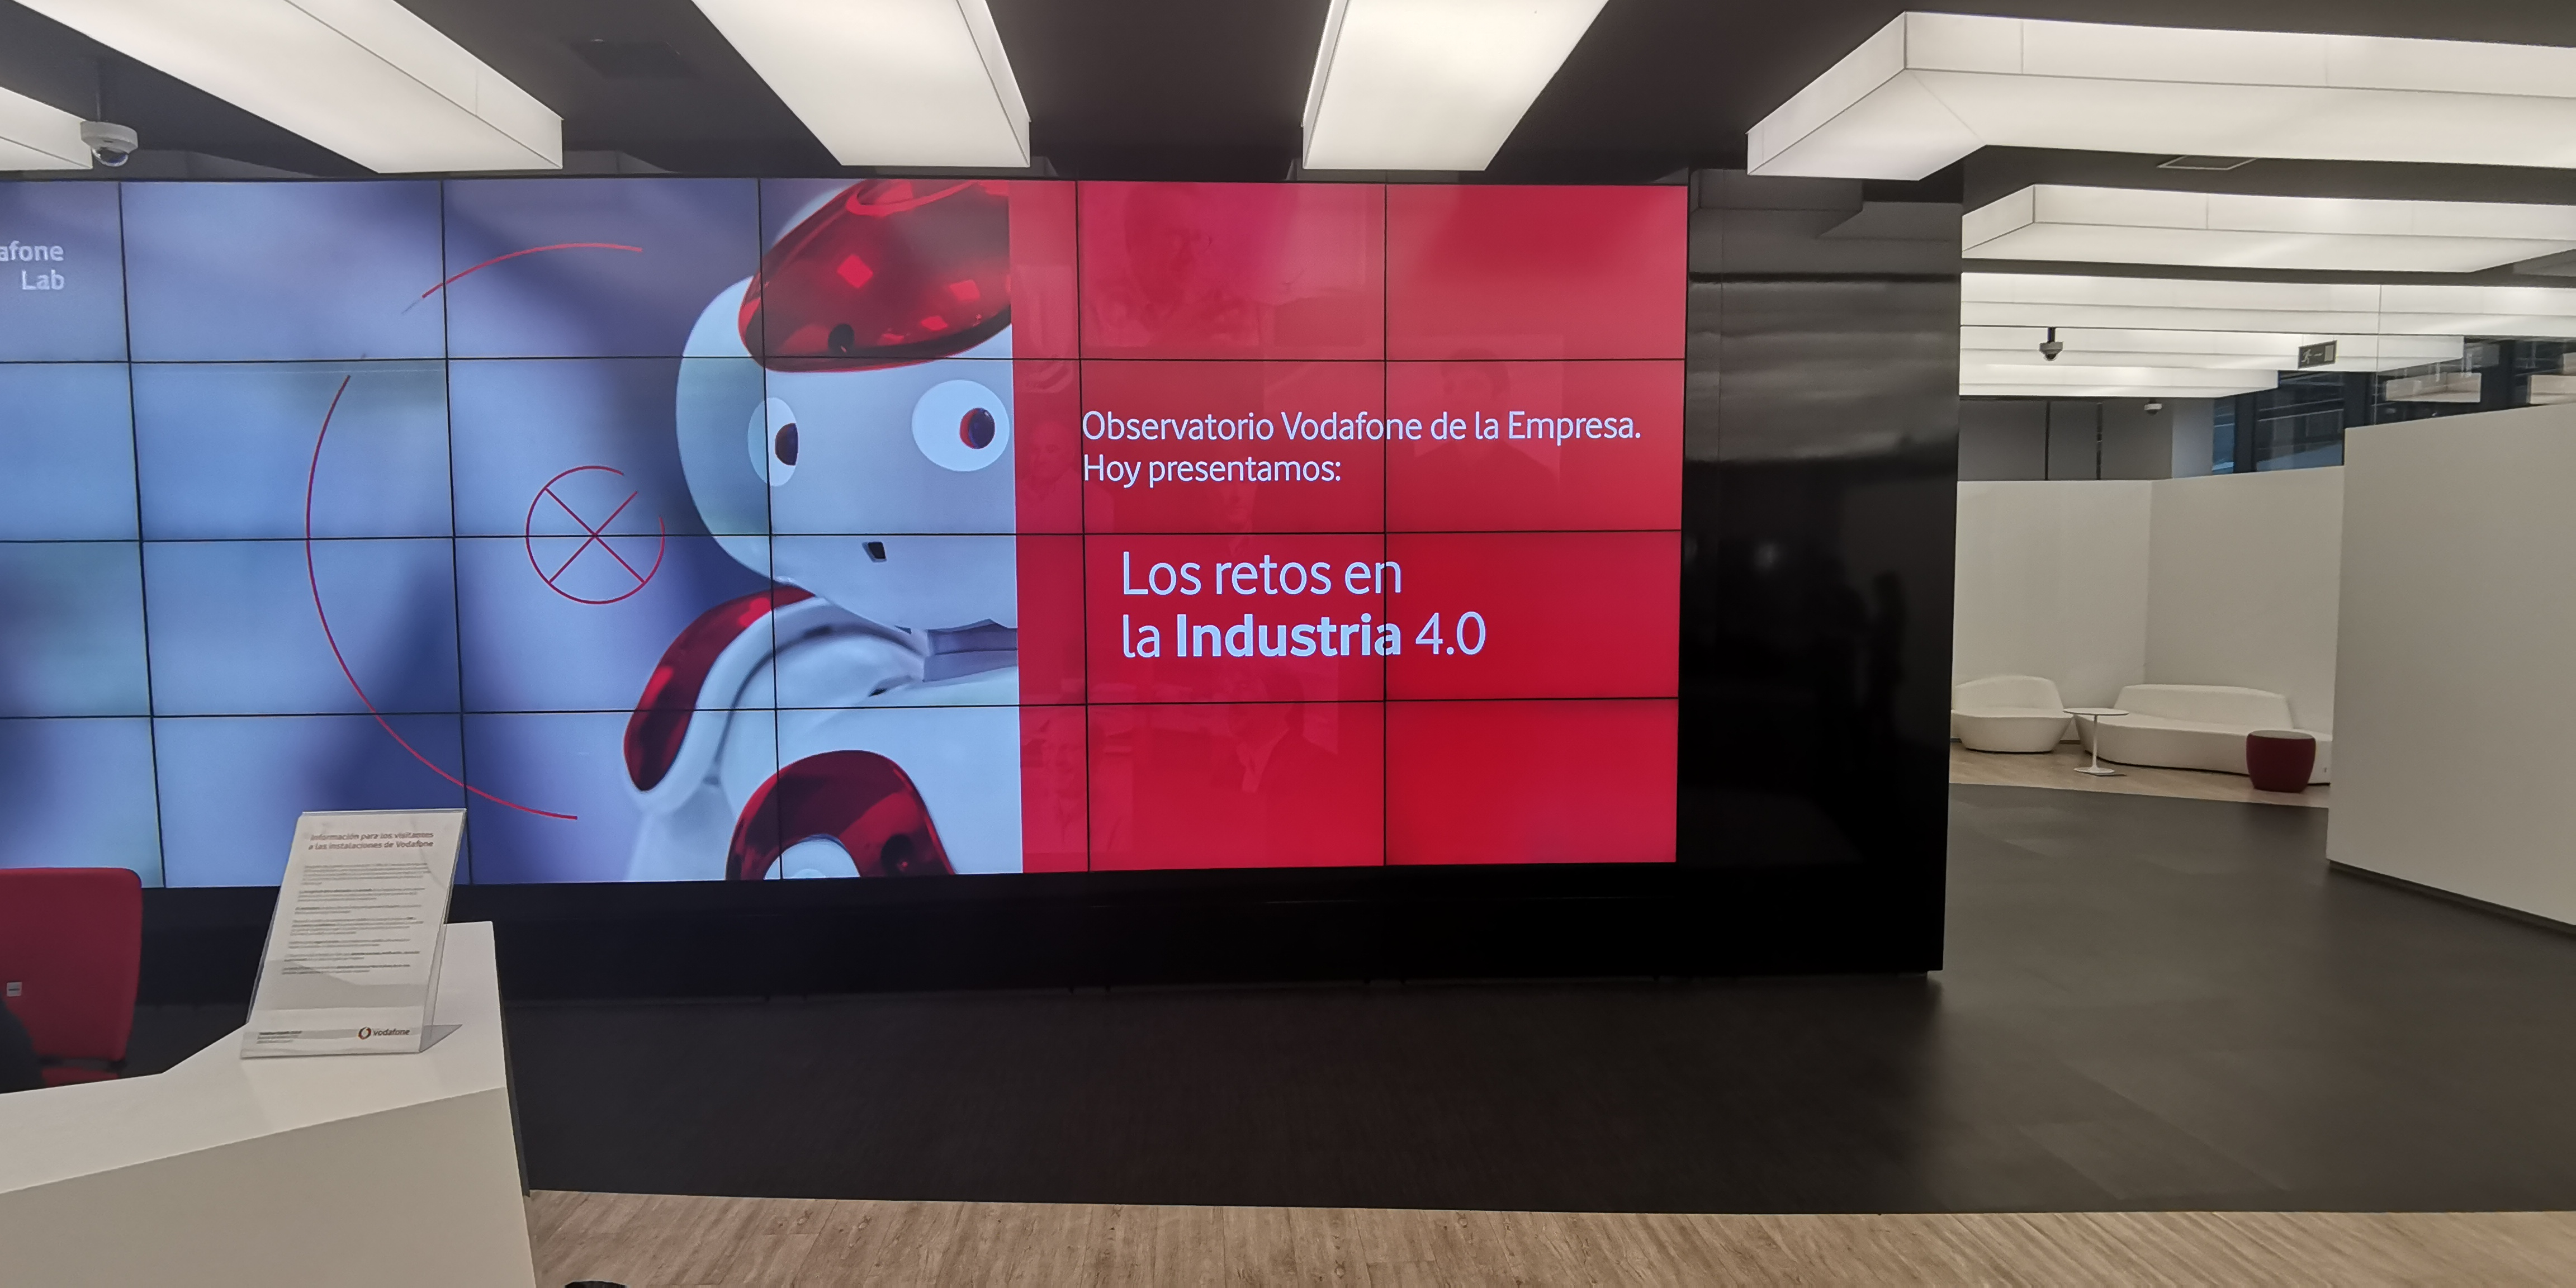 Observatorio Vodafone de la Empresa. Industria 4.0